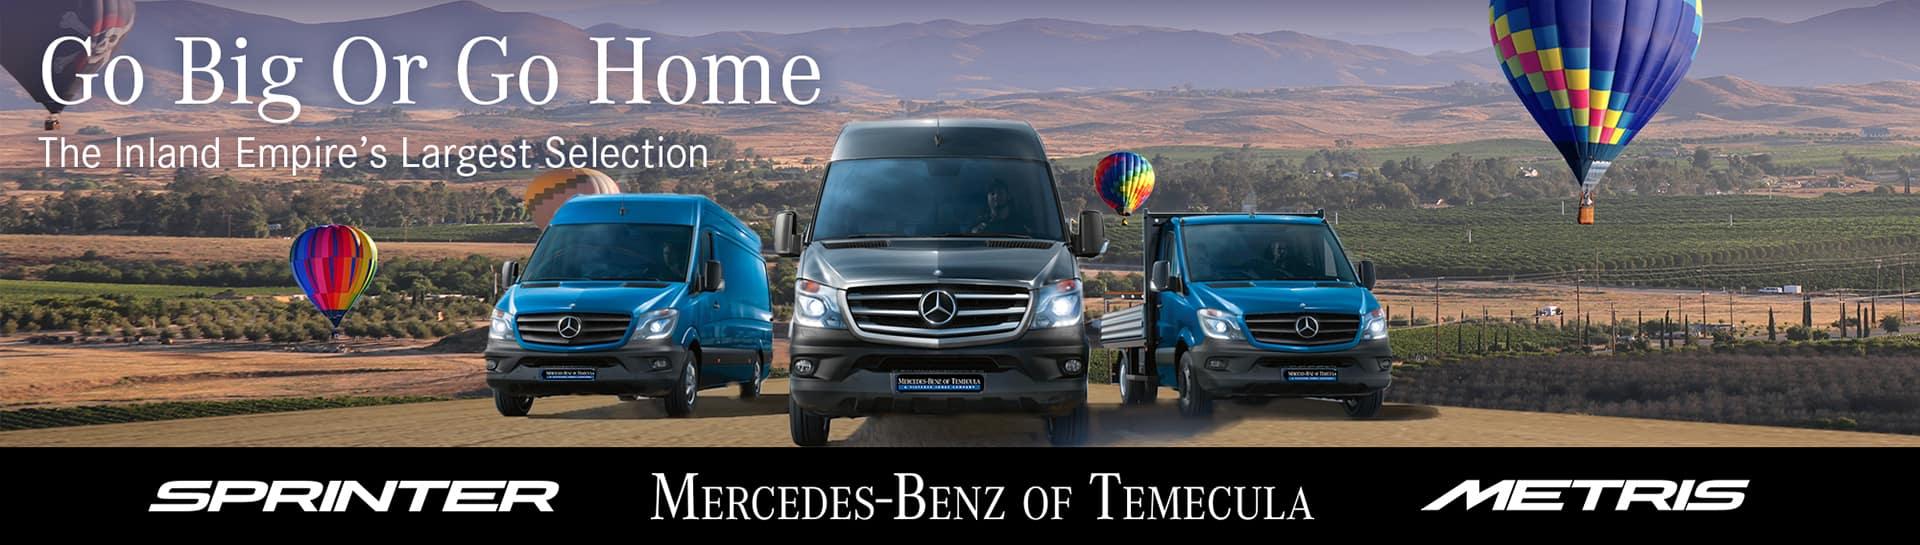 Mercedes-Benz Sprinter and Metris | Mercedes-Benz of Temecula